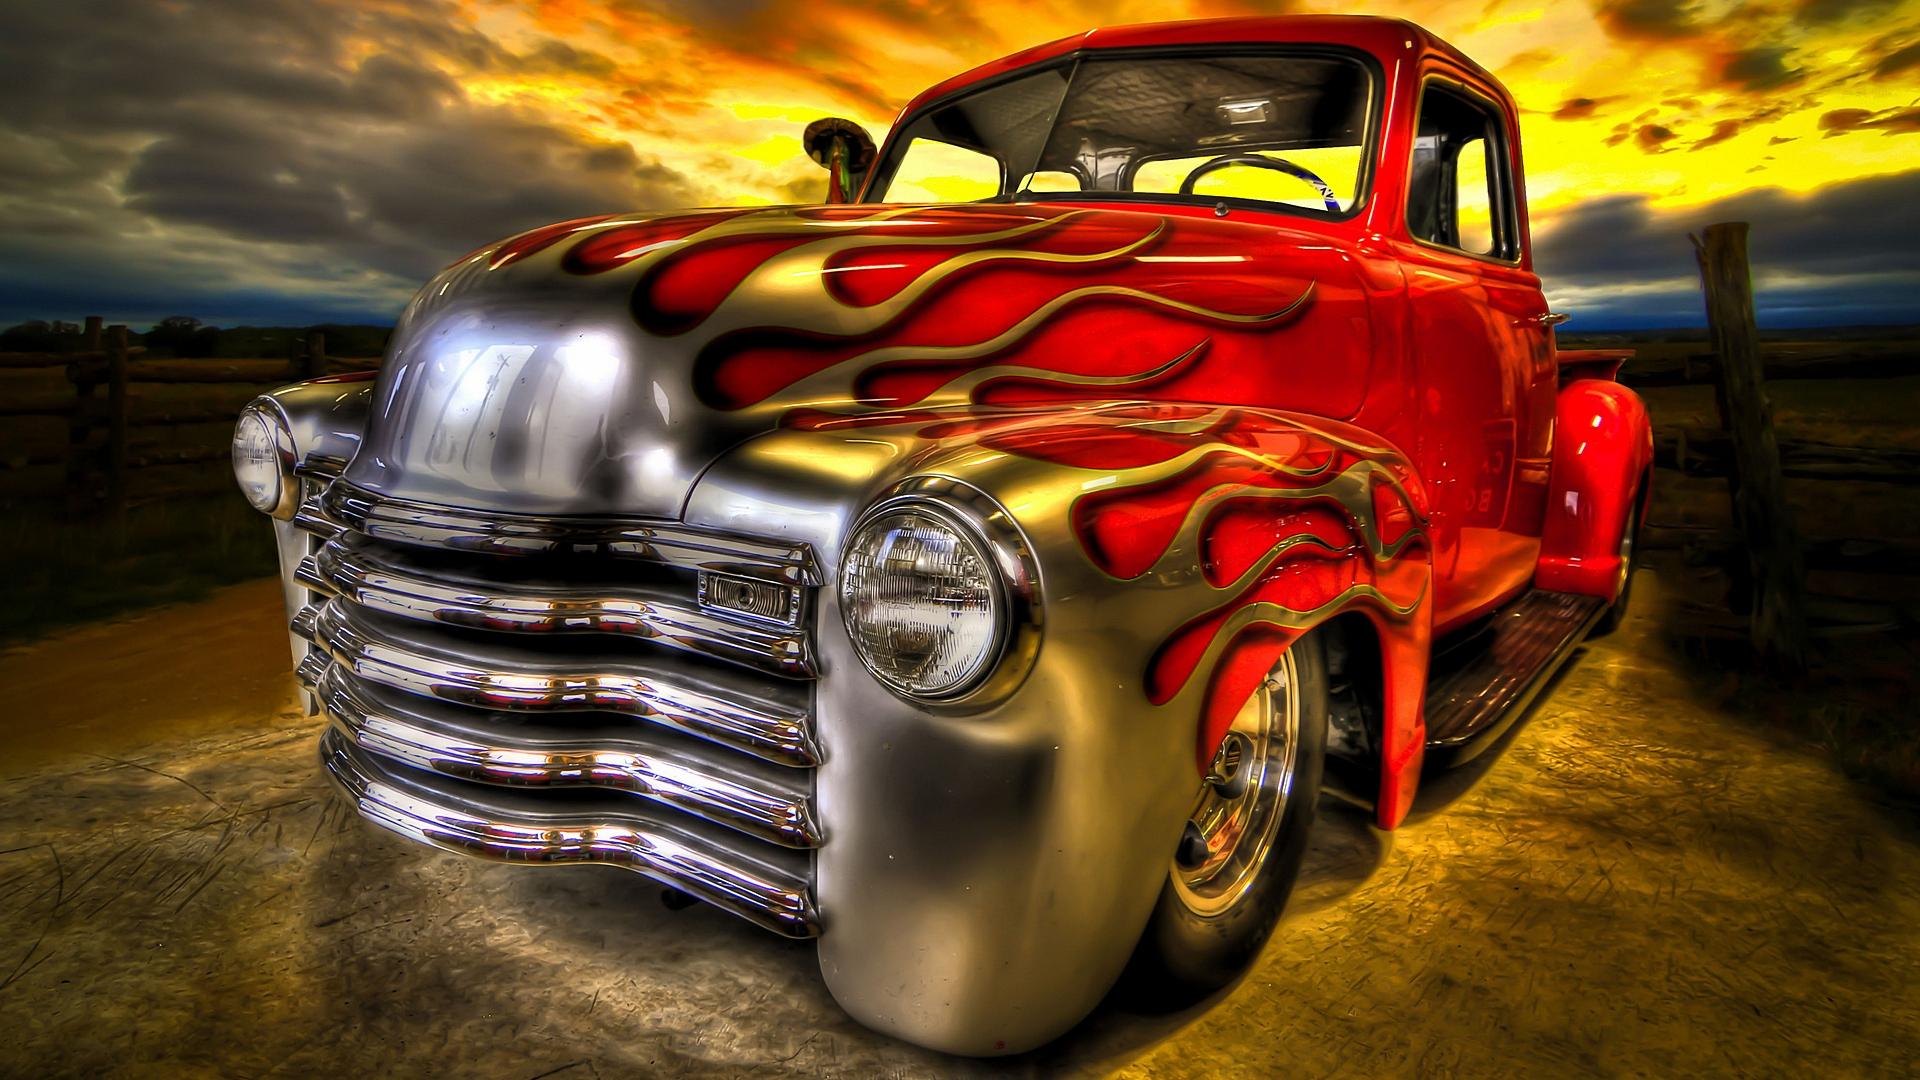 4x4 Hd Wallpapers >> Wallpaper Old Trucks - WallpaperSafari